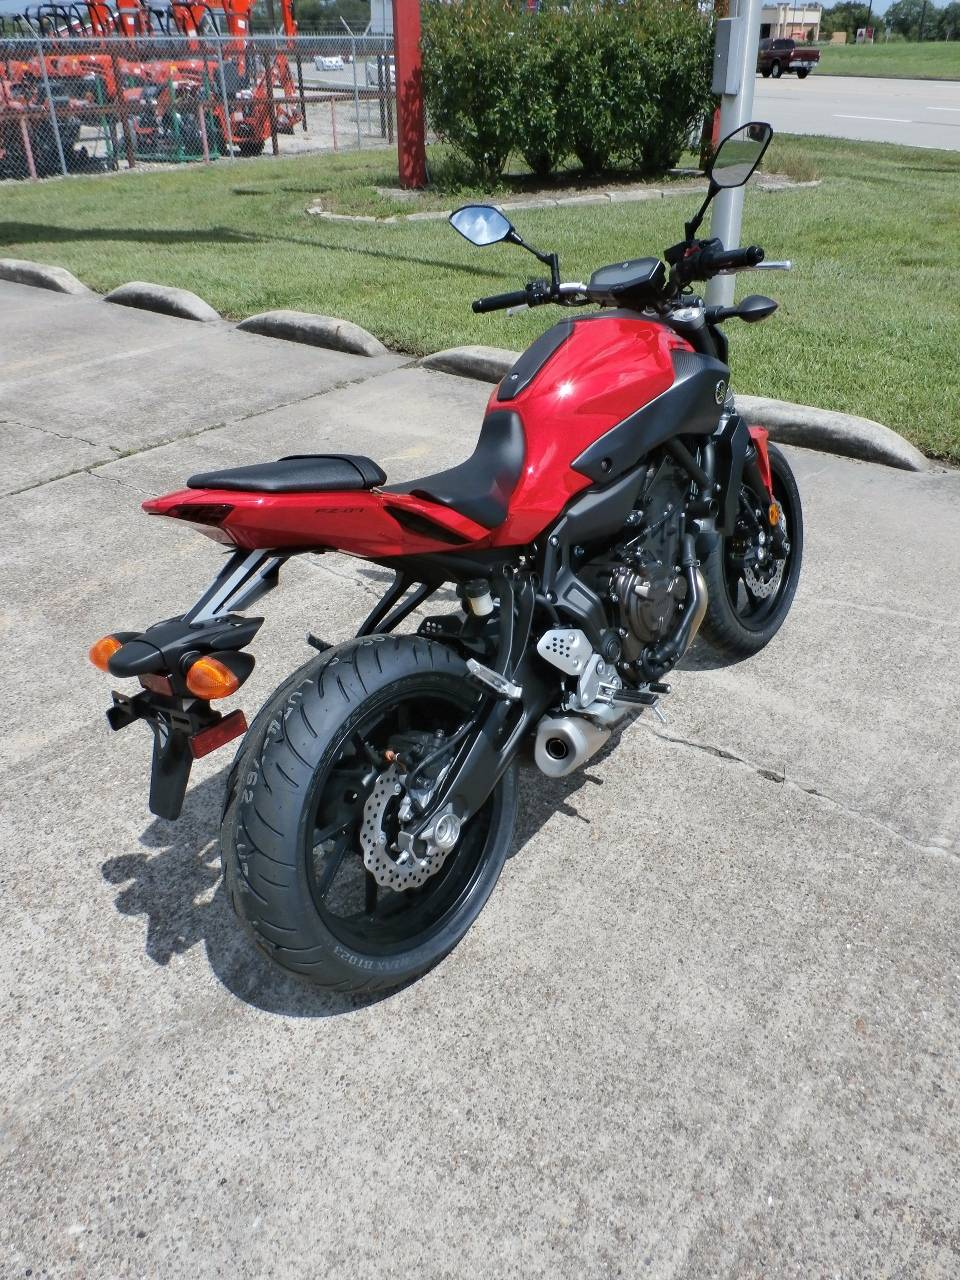 2017 Yamaha FZ-07 ABS 3